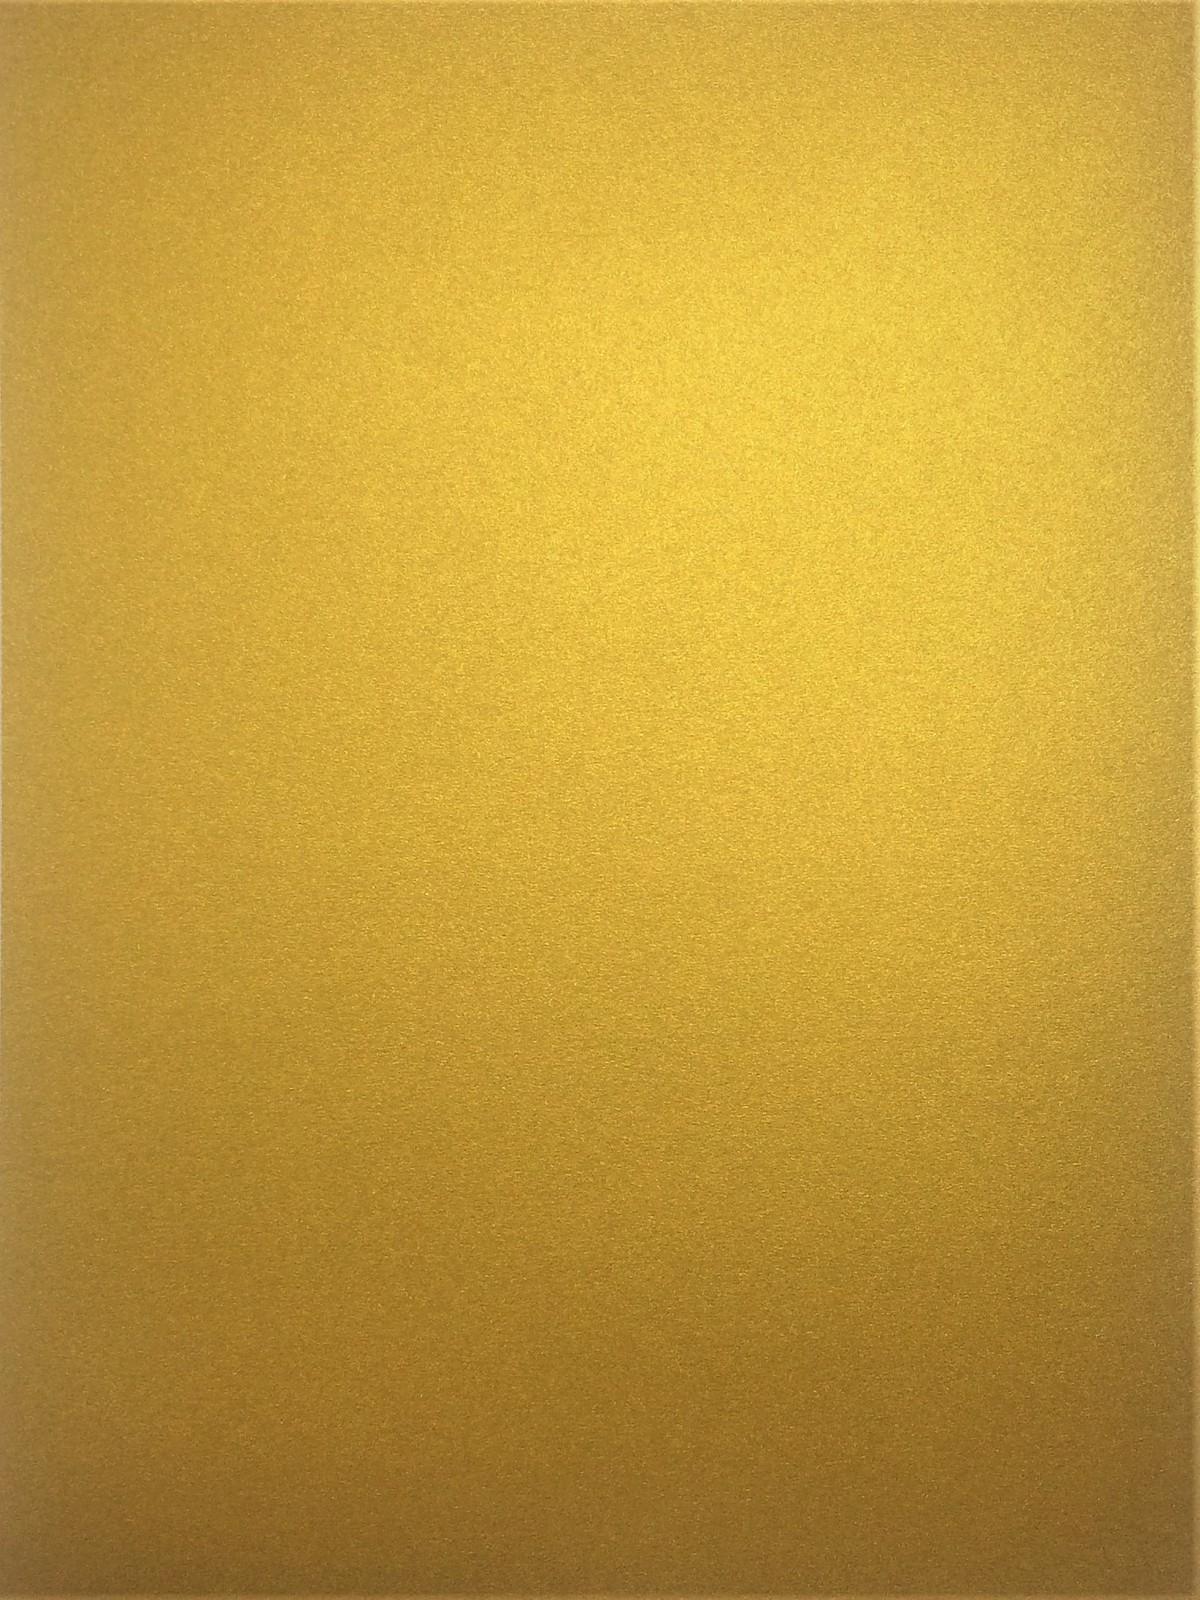 Astara Athena Gold Metallic Paper A4 120gsm Amazing Paper